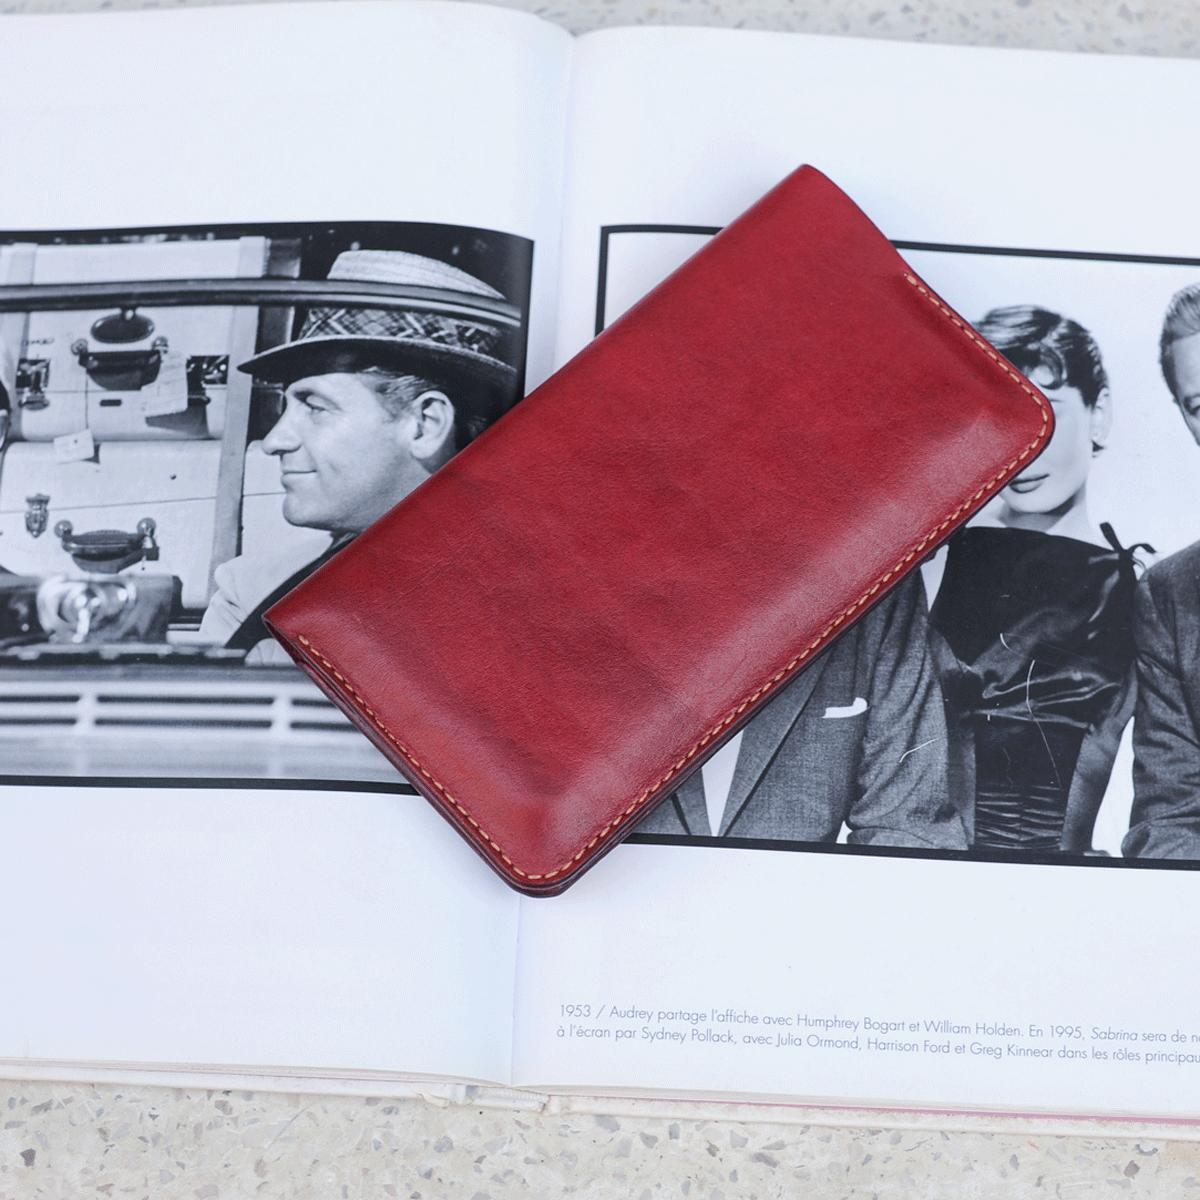 Ví dài cầm tay - Ví cầm tay da bò - Ví dài nữ - Ví dài cầm tay nữ màu đỏ đô handmade - Ví dài cầm tay nữ Mino Crafts VI219